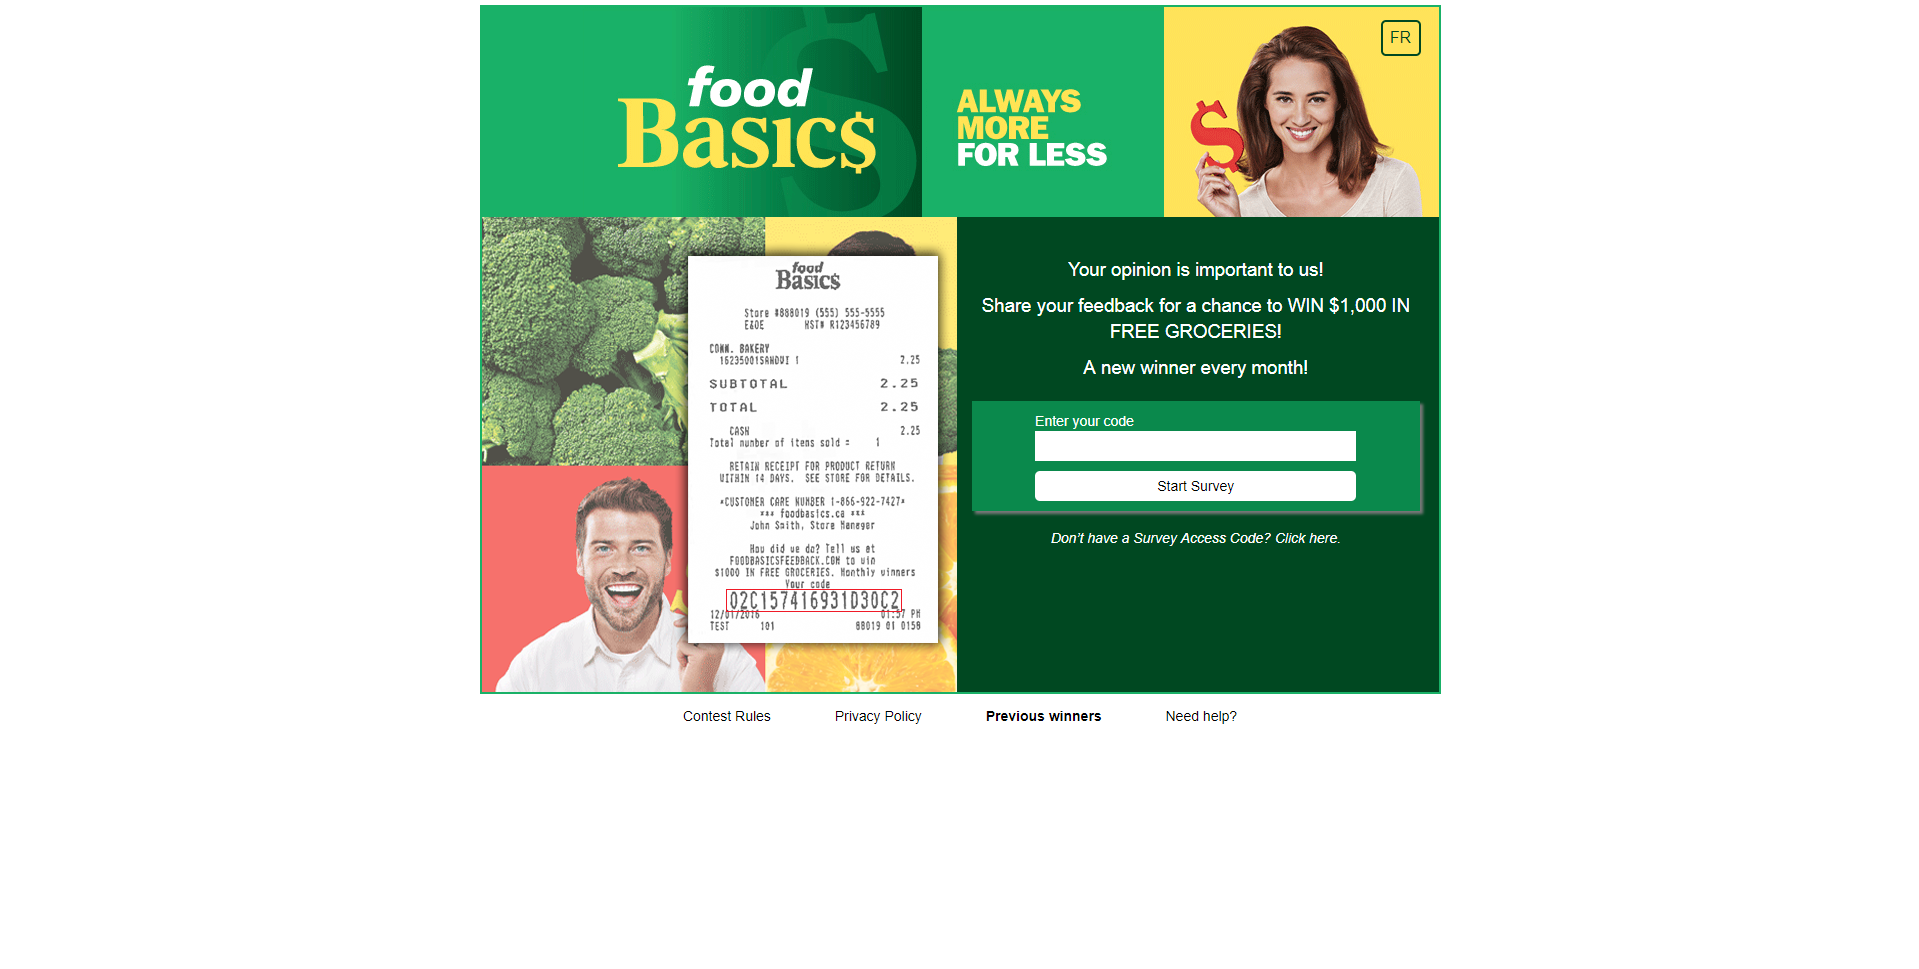 www.foodbasicsfeedback.com